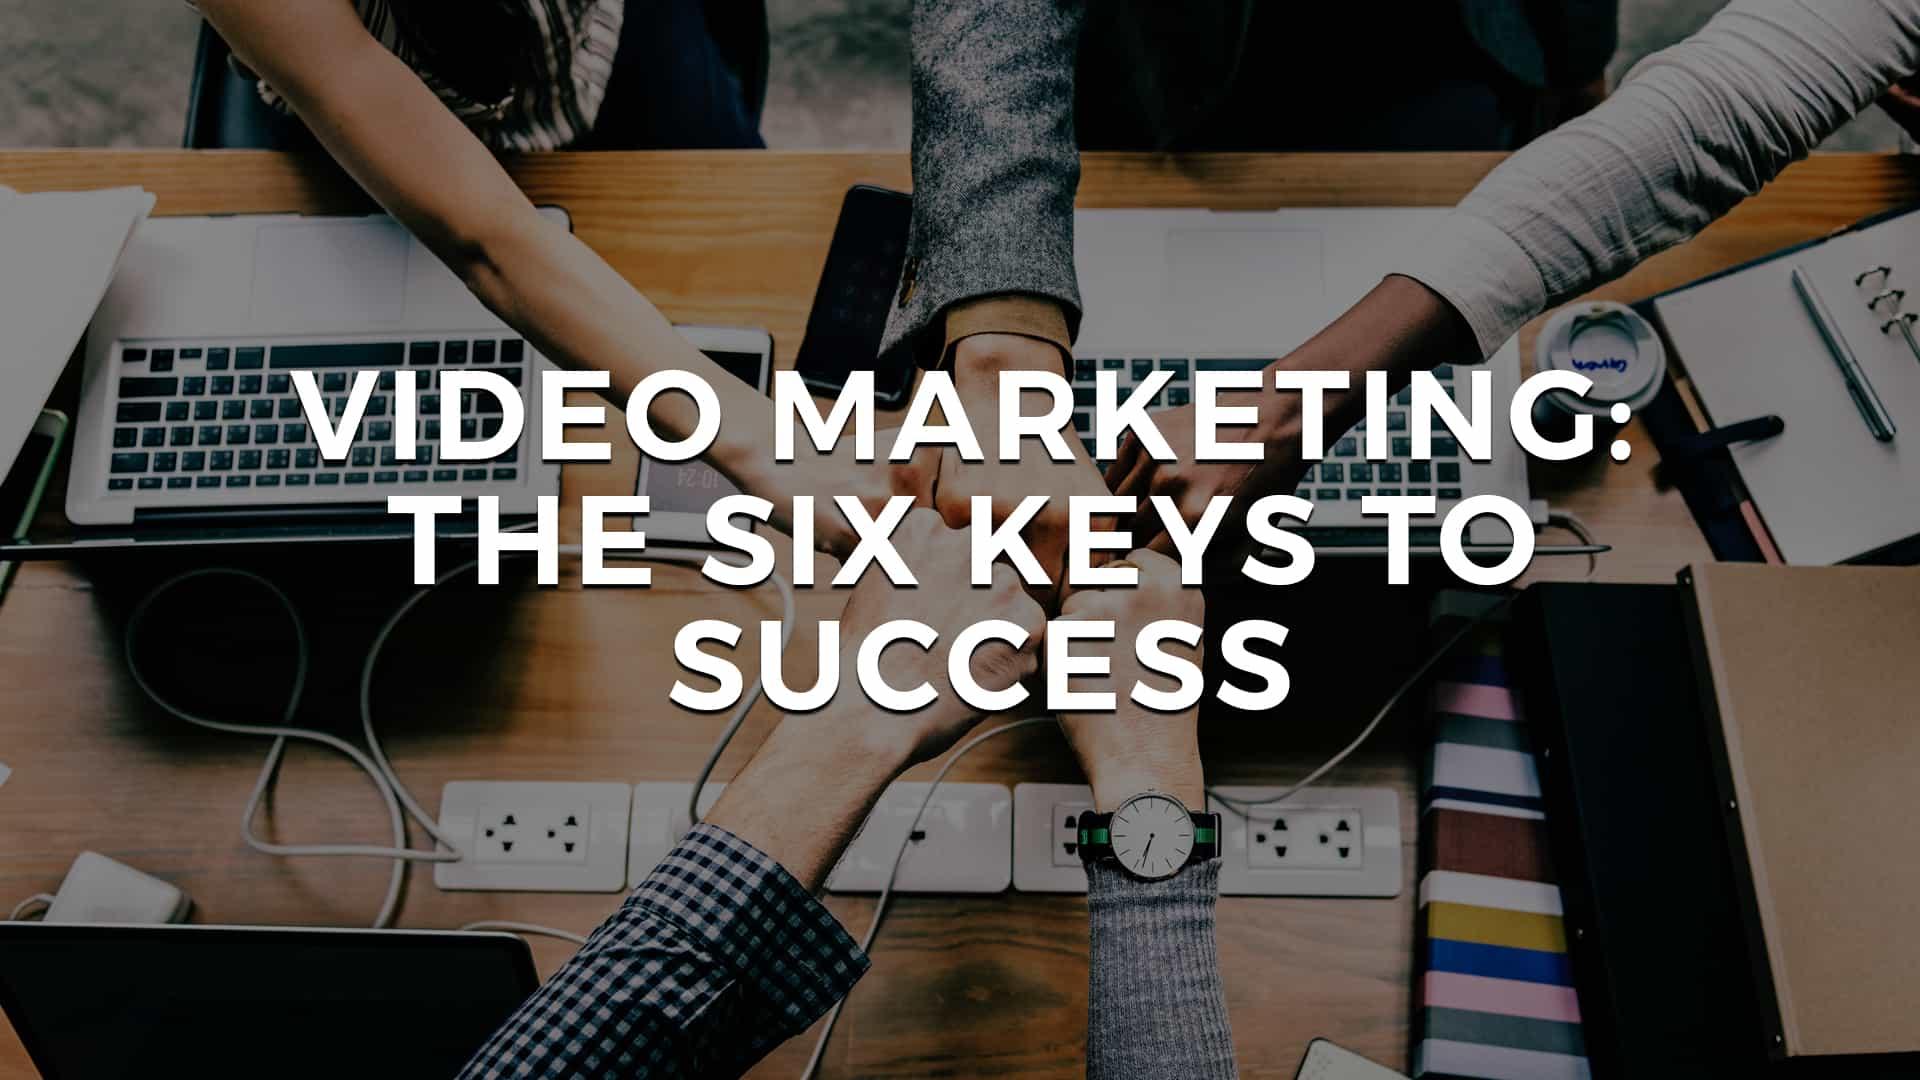 Video Marketing: The Six Keys to Success